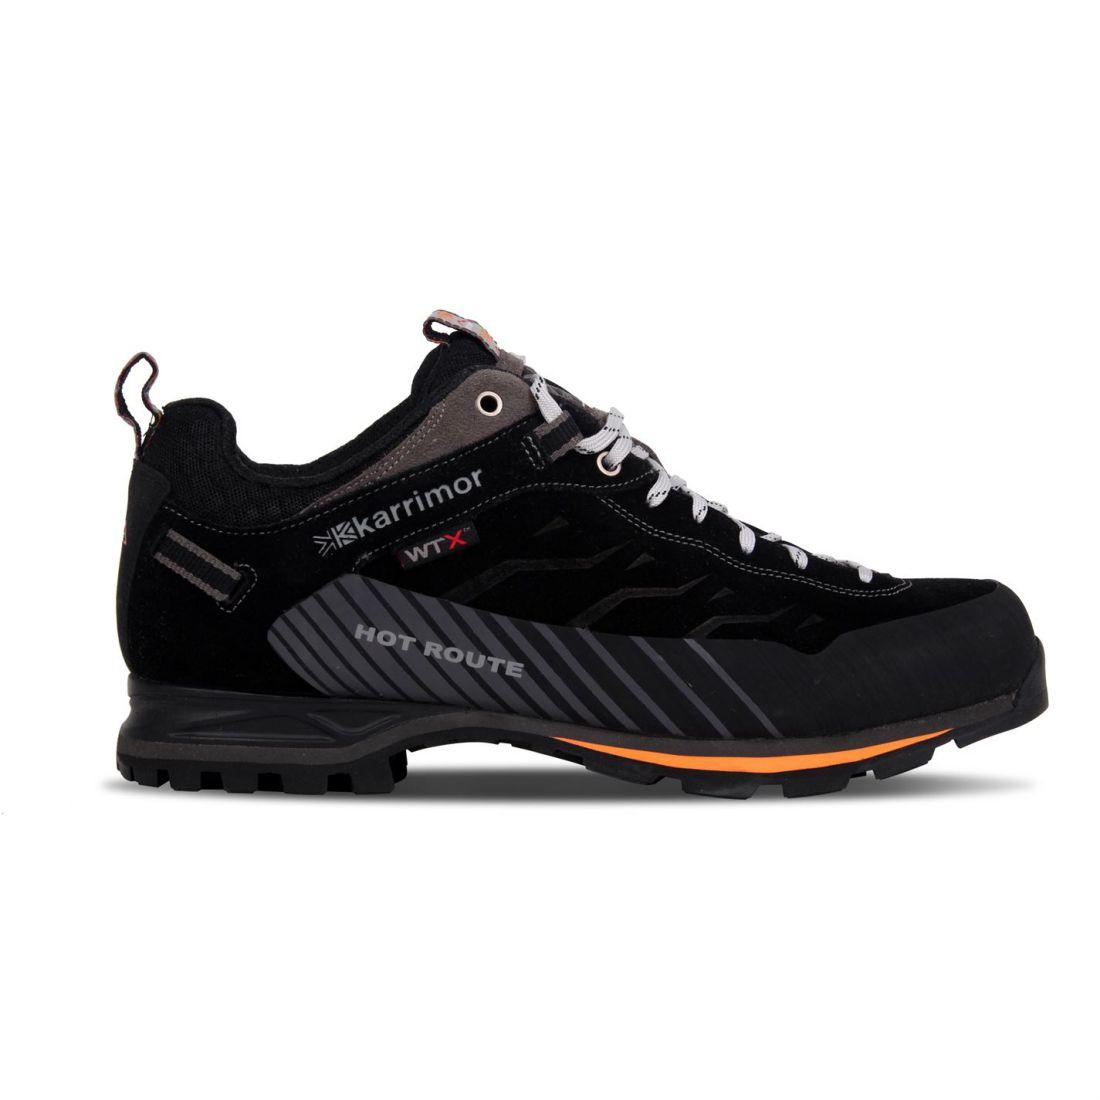 karrimor mens hot route wtx walking shoes waterproof lace up rh ebay co uk